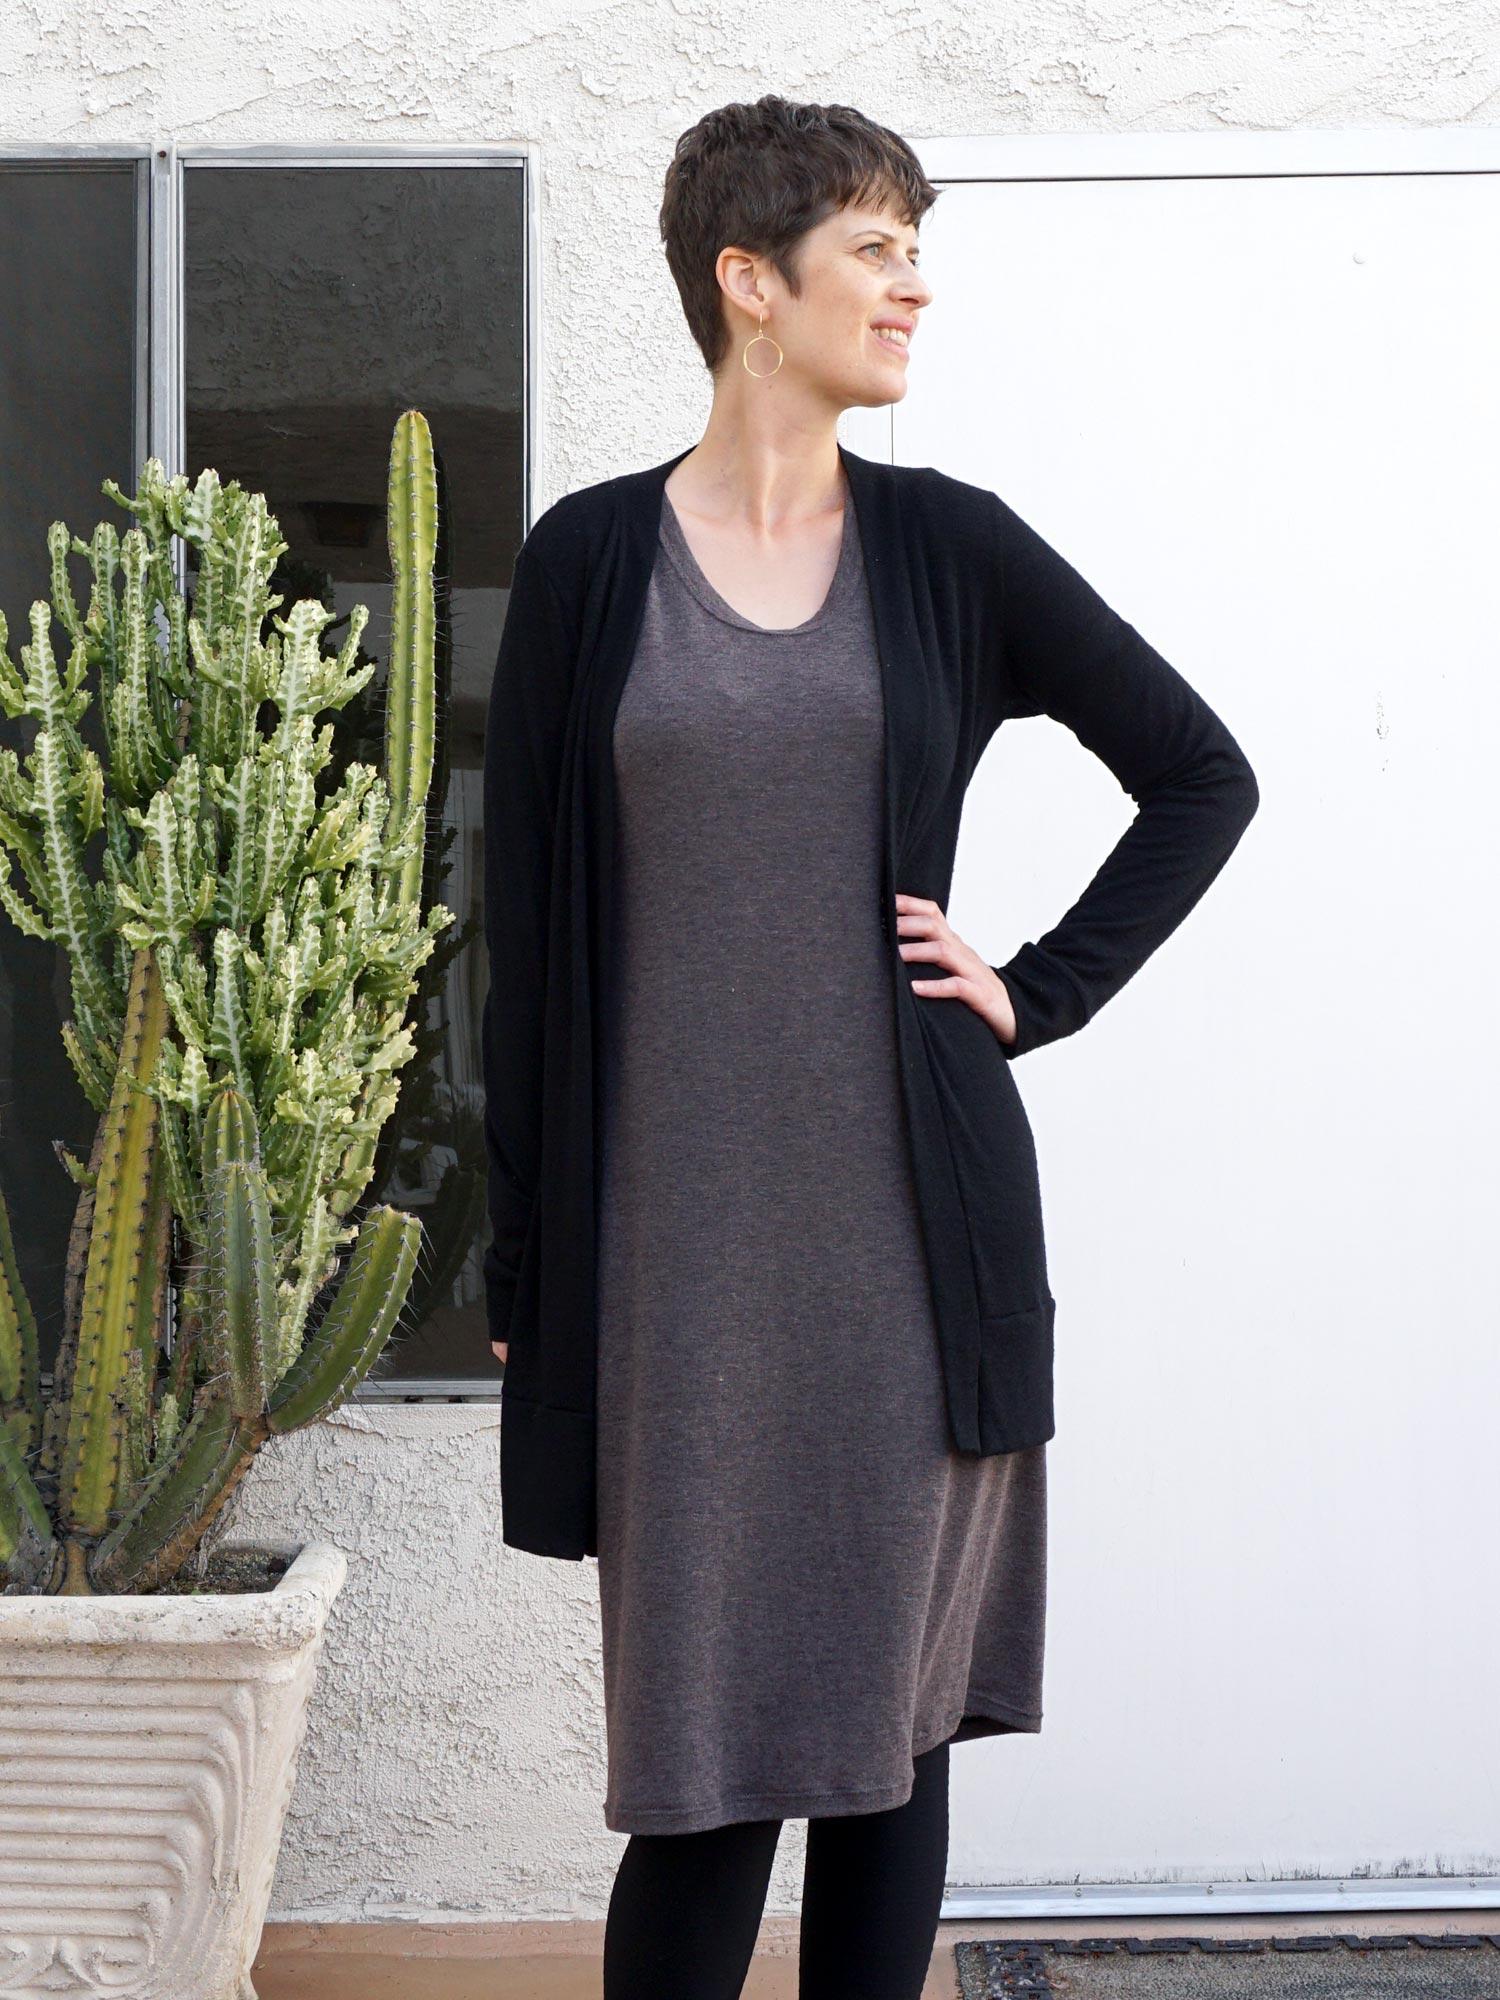 My DIY Travel Outfit – Neenah Dress & Blackwood Cardigan   Sew DIY